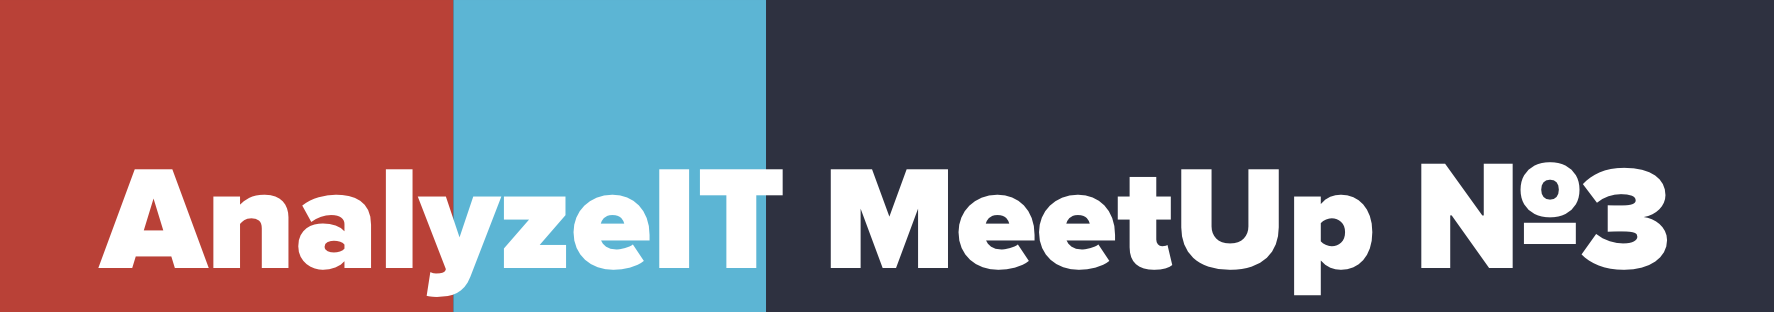 22 ноября, Москва — AnalyzeIT MeetUp №3